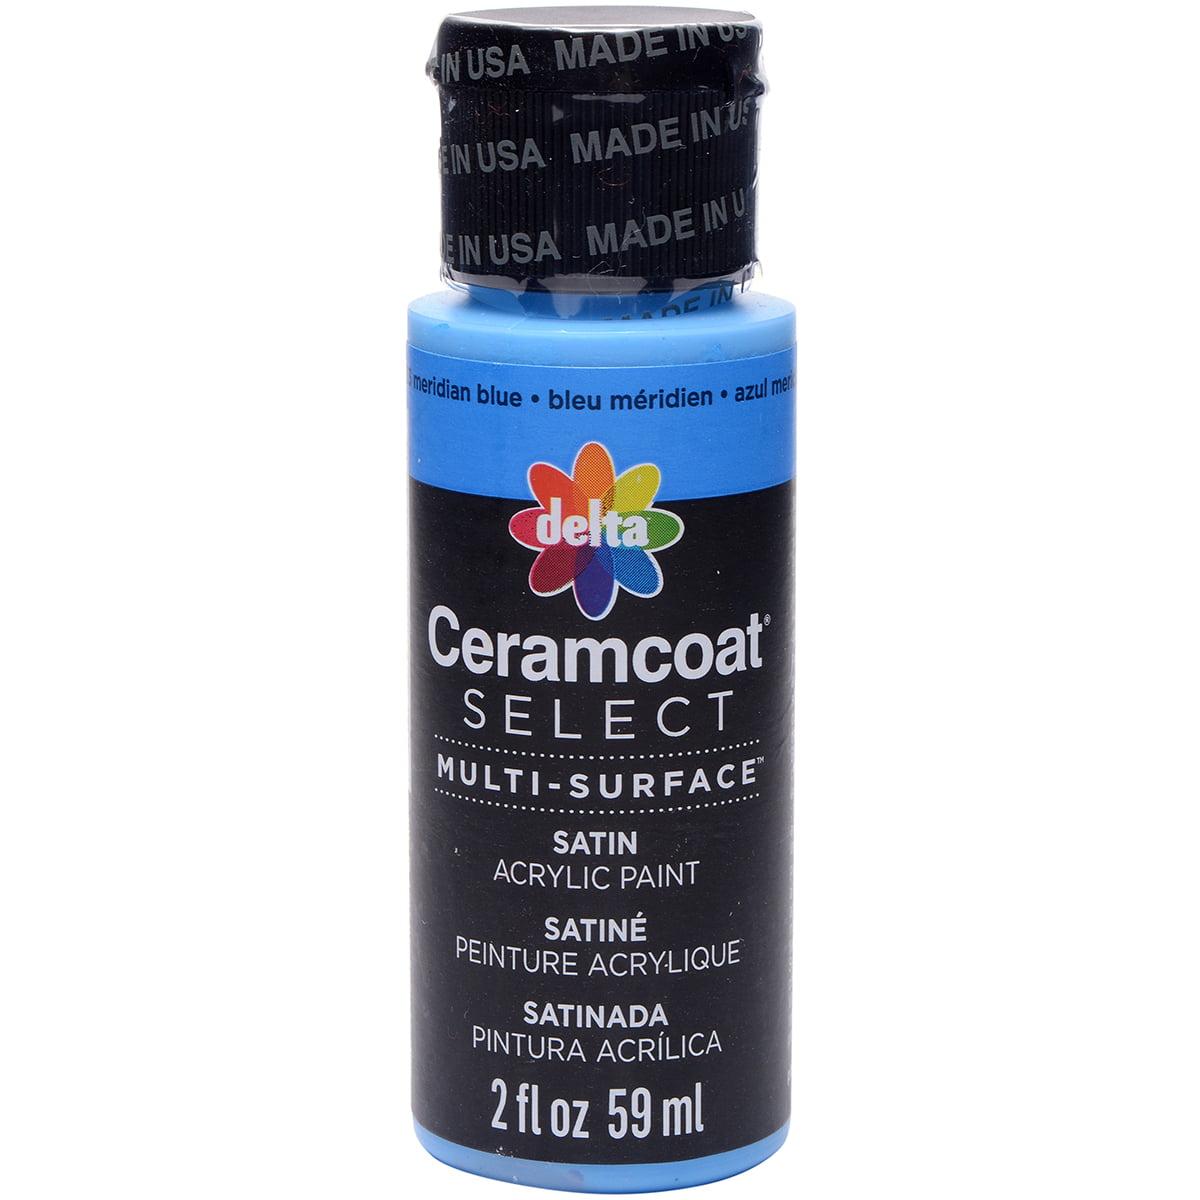 Ceramcoat Select Multi-Surface Paint 2oz-Meridian Blue